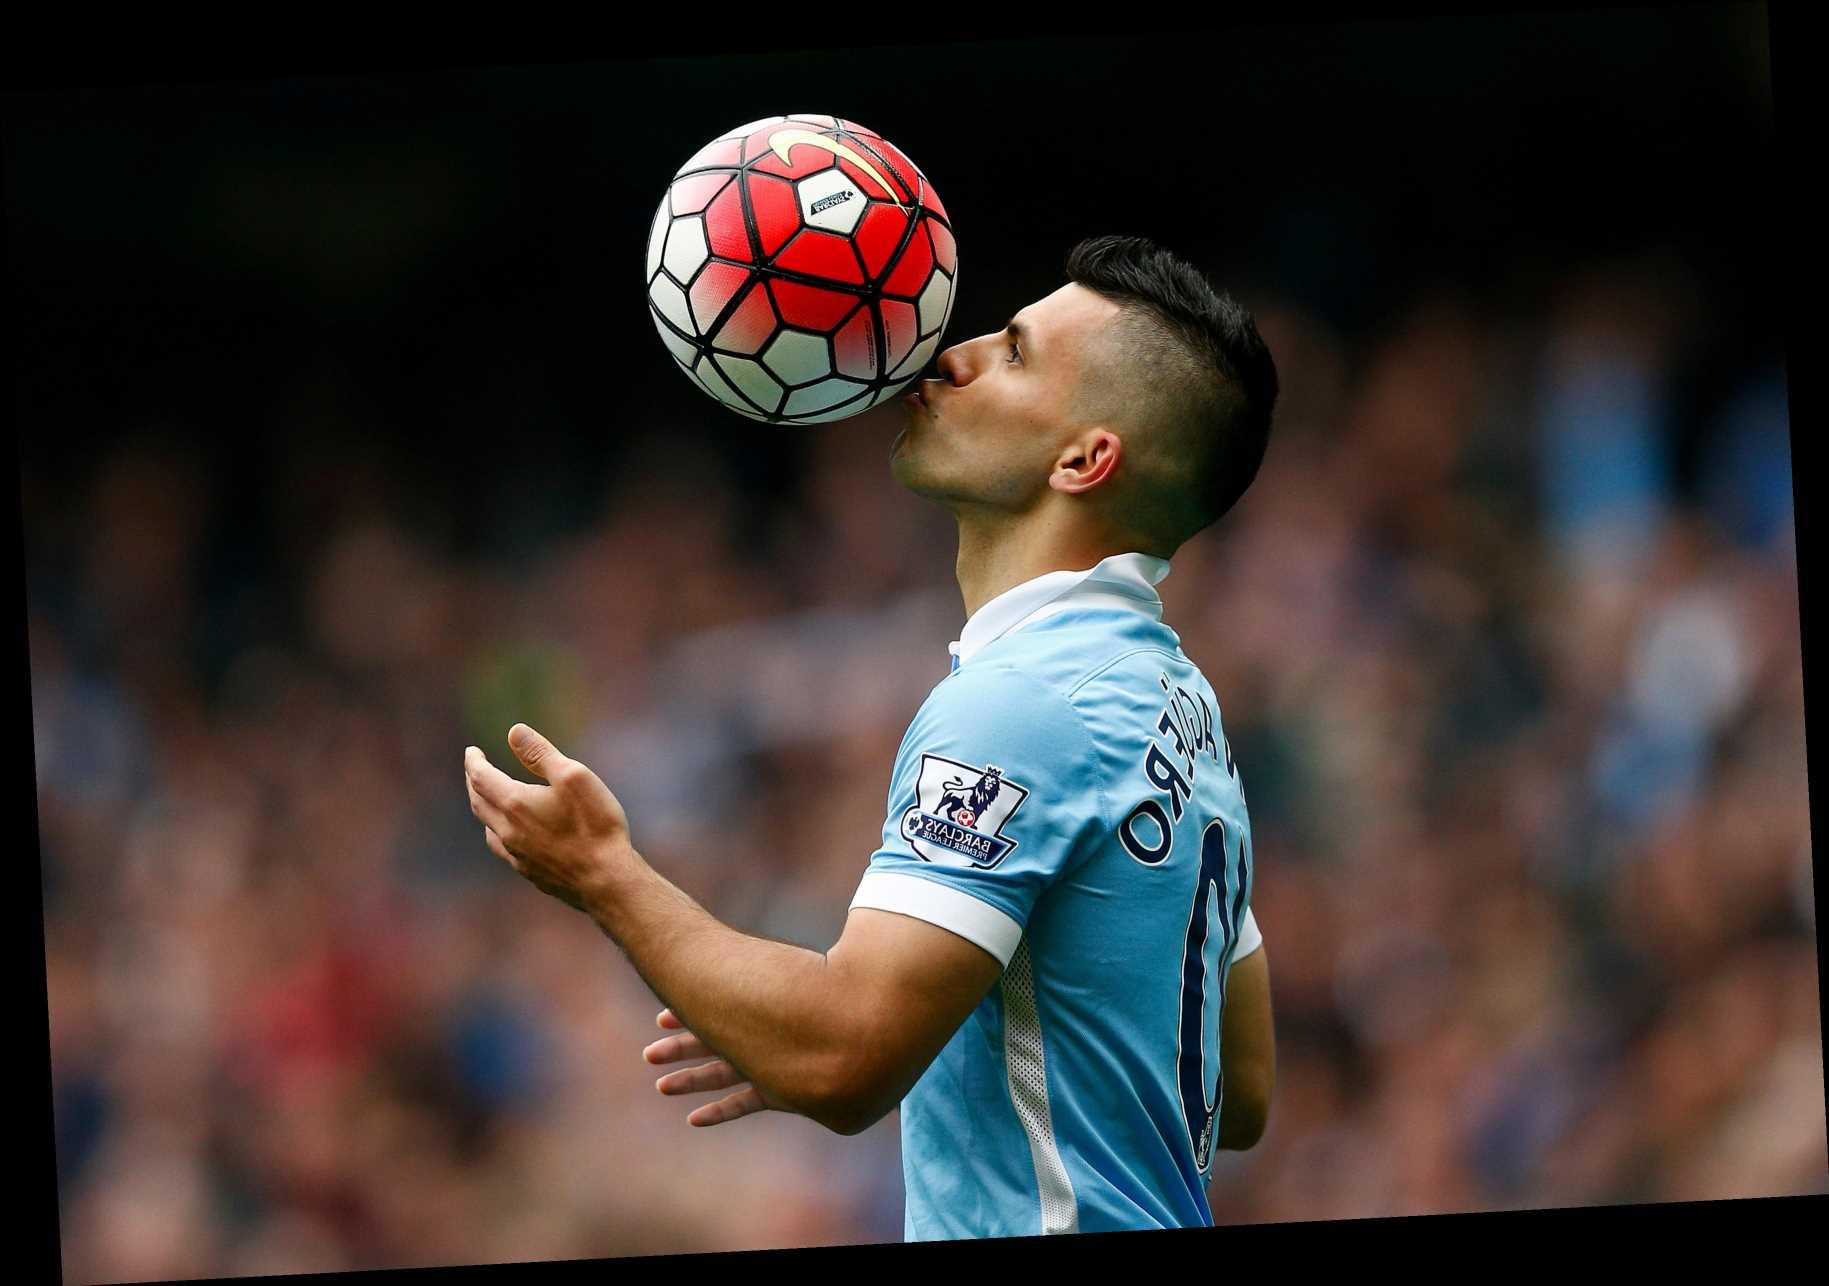 In celebration of Sergio Aguero — quite literally the best goalscorer in Premier League history